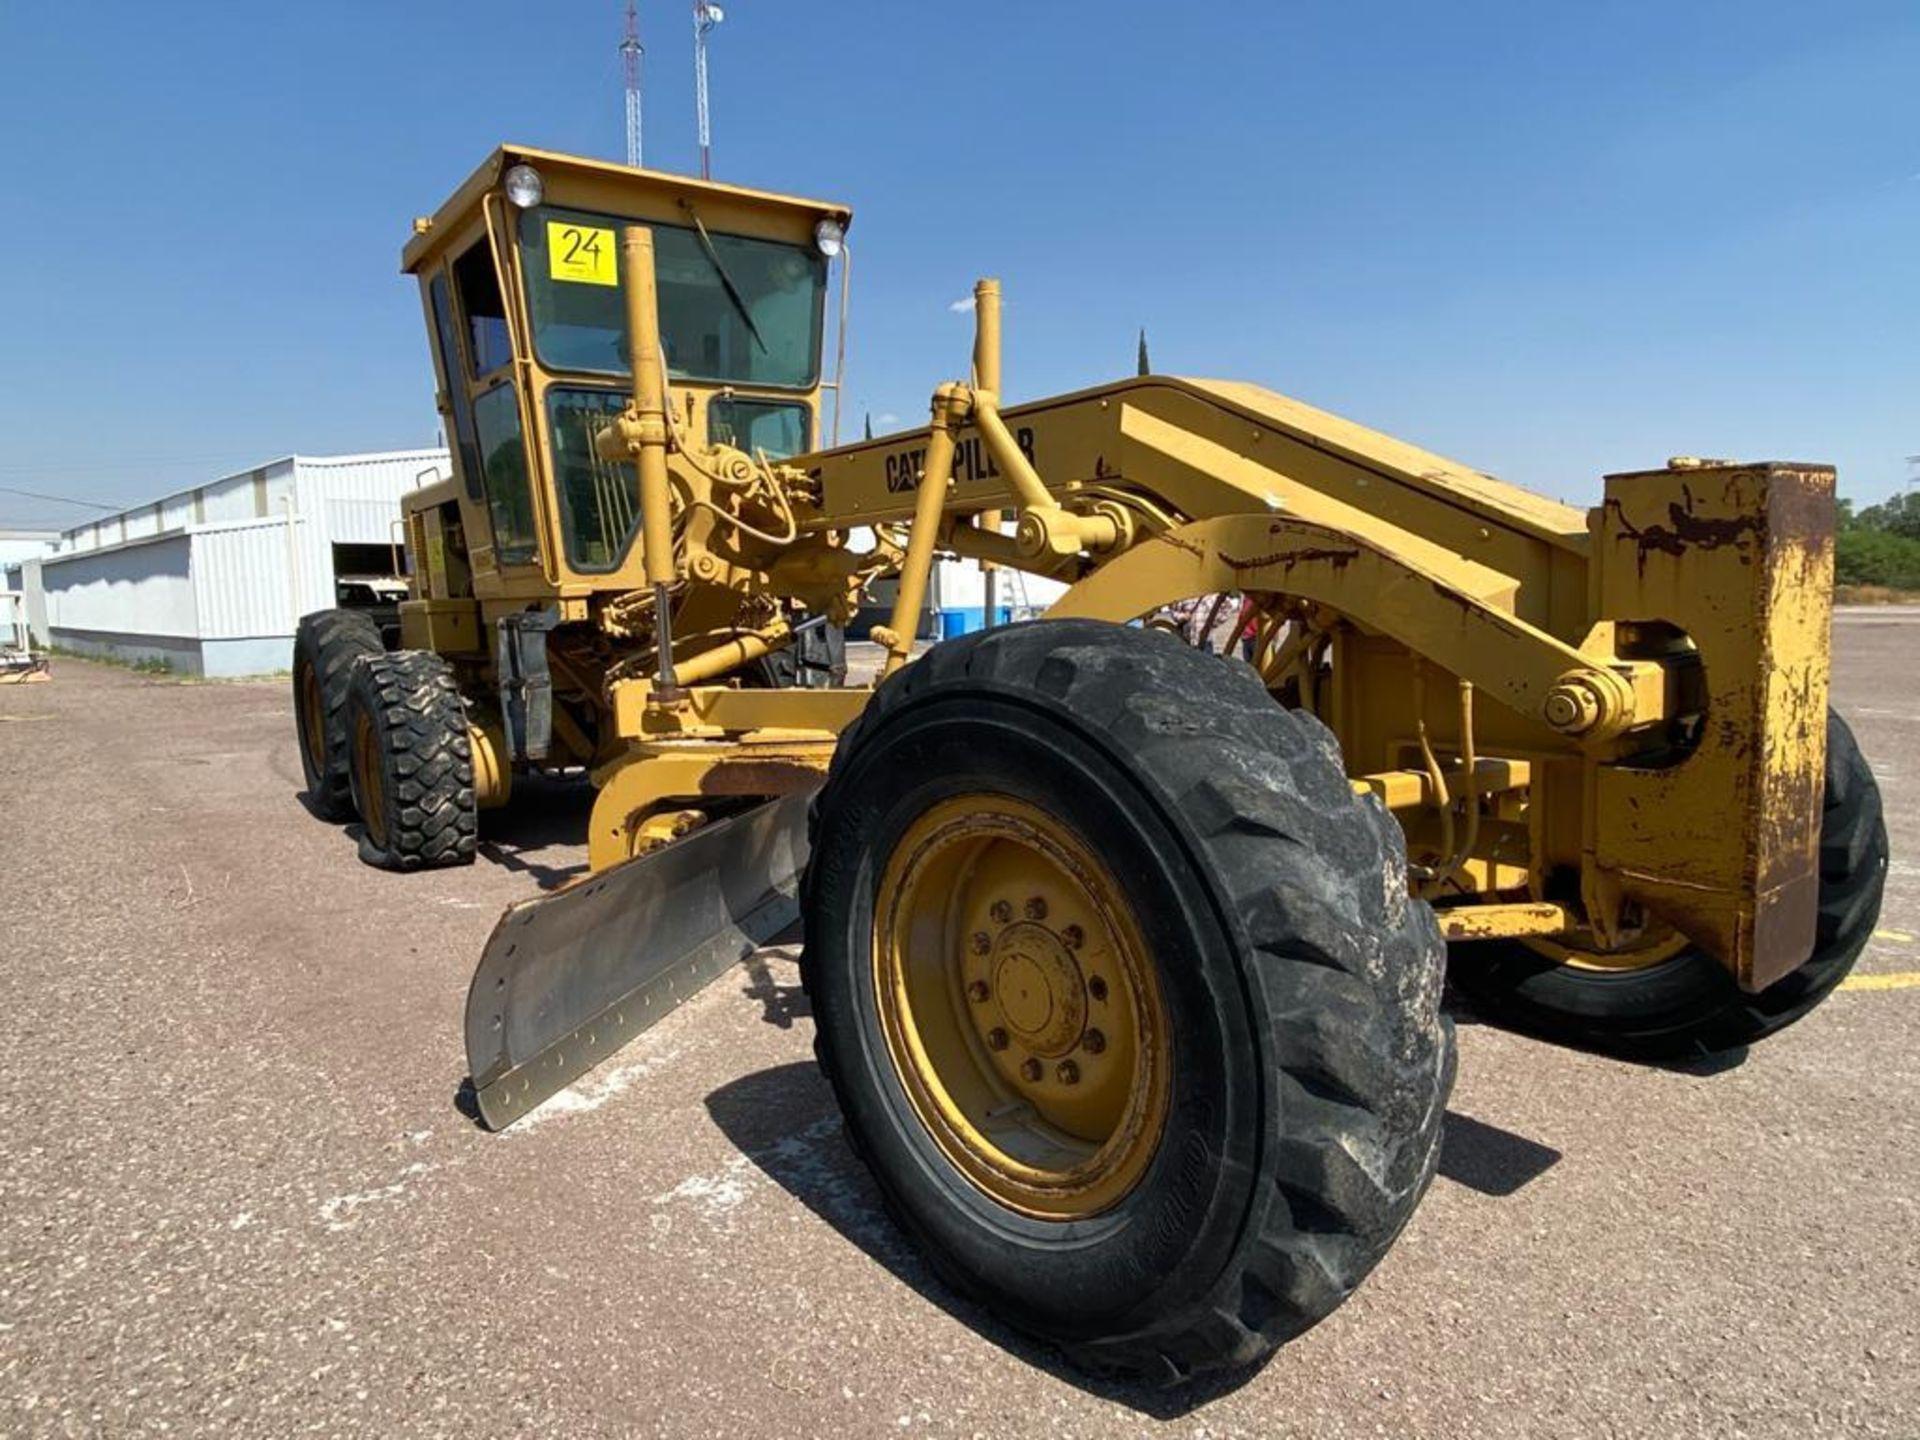 Caterpillar 120G Motor Grader, Serial number 87V09646, Motor number PQ883-2/07Z28983 - Image 2 of 61